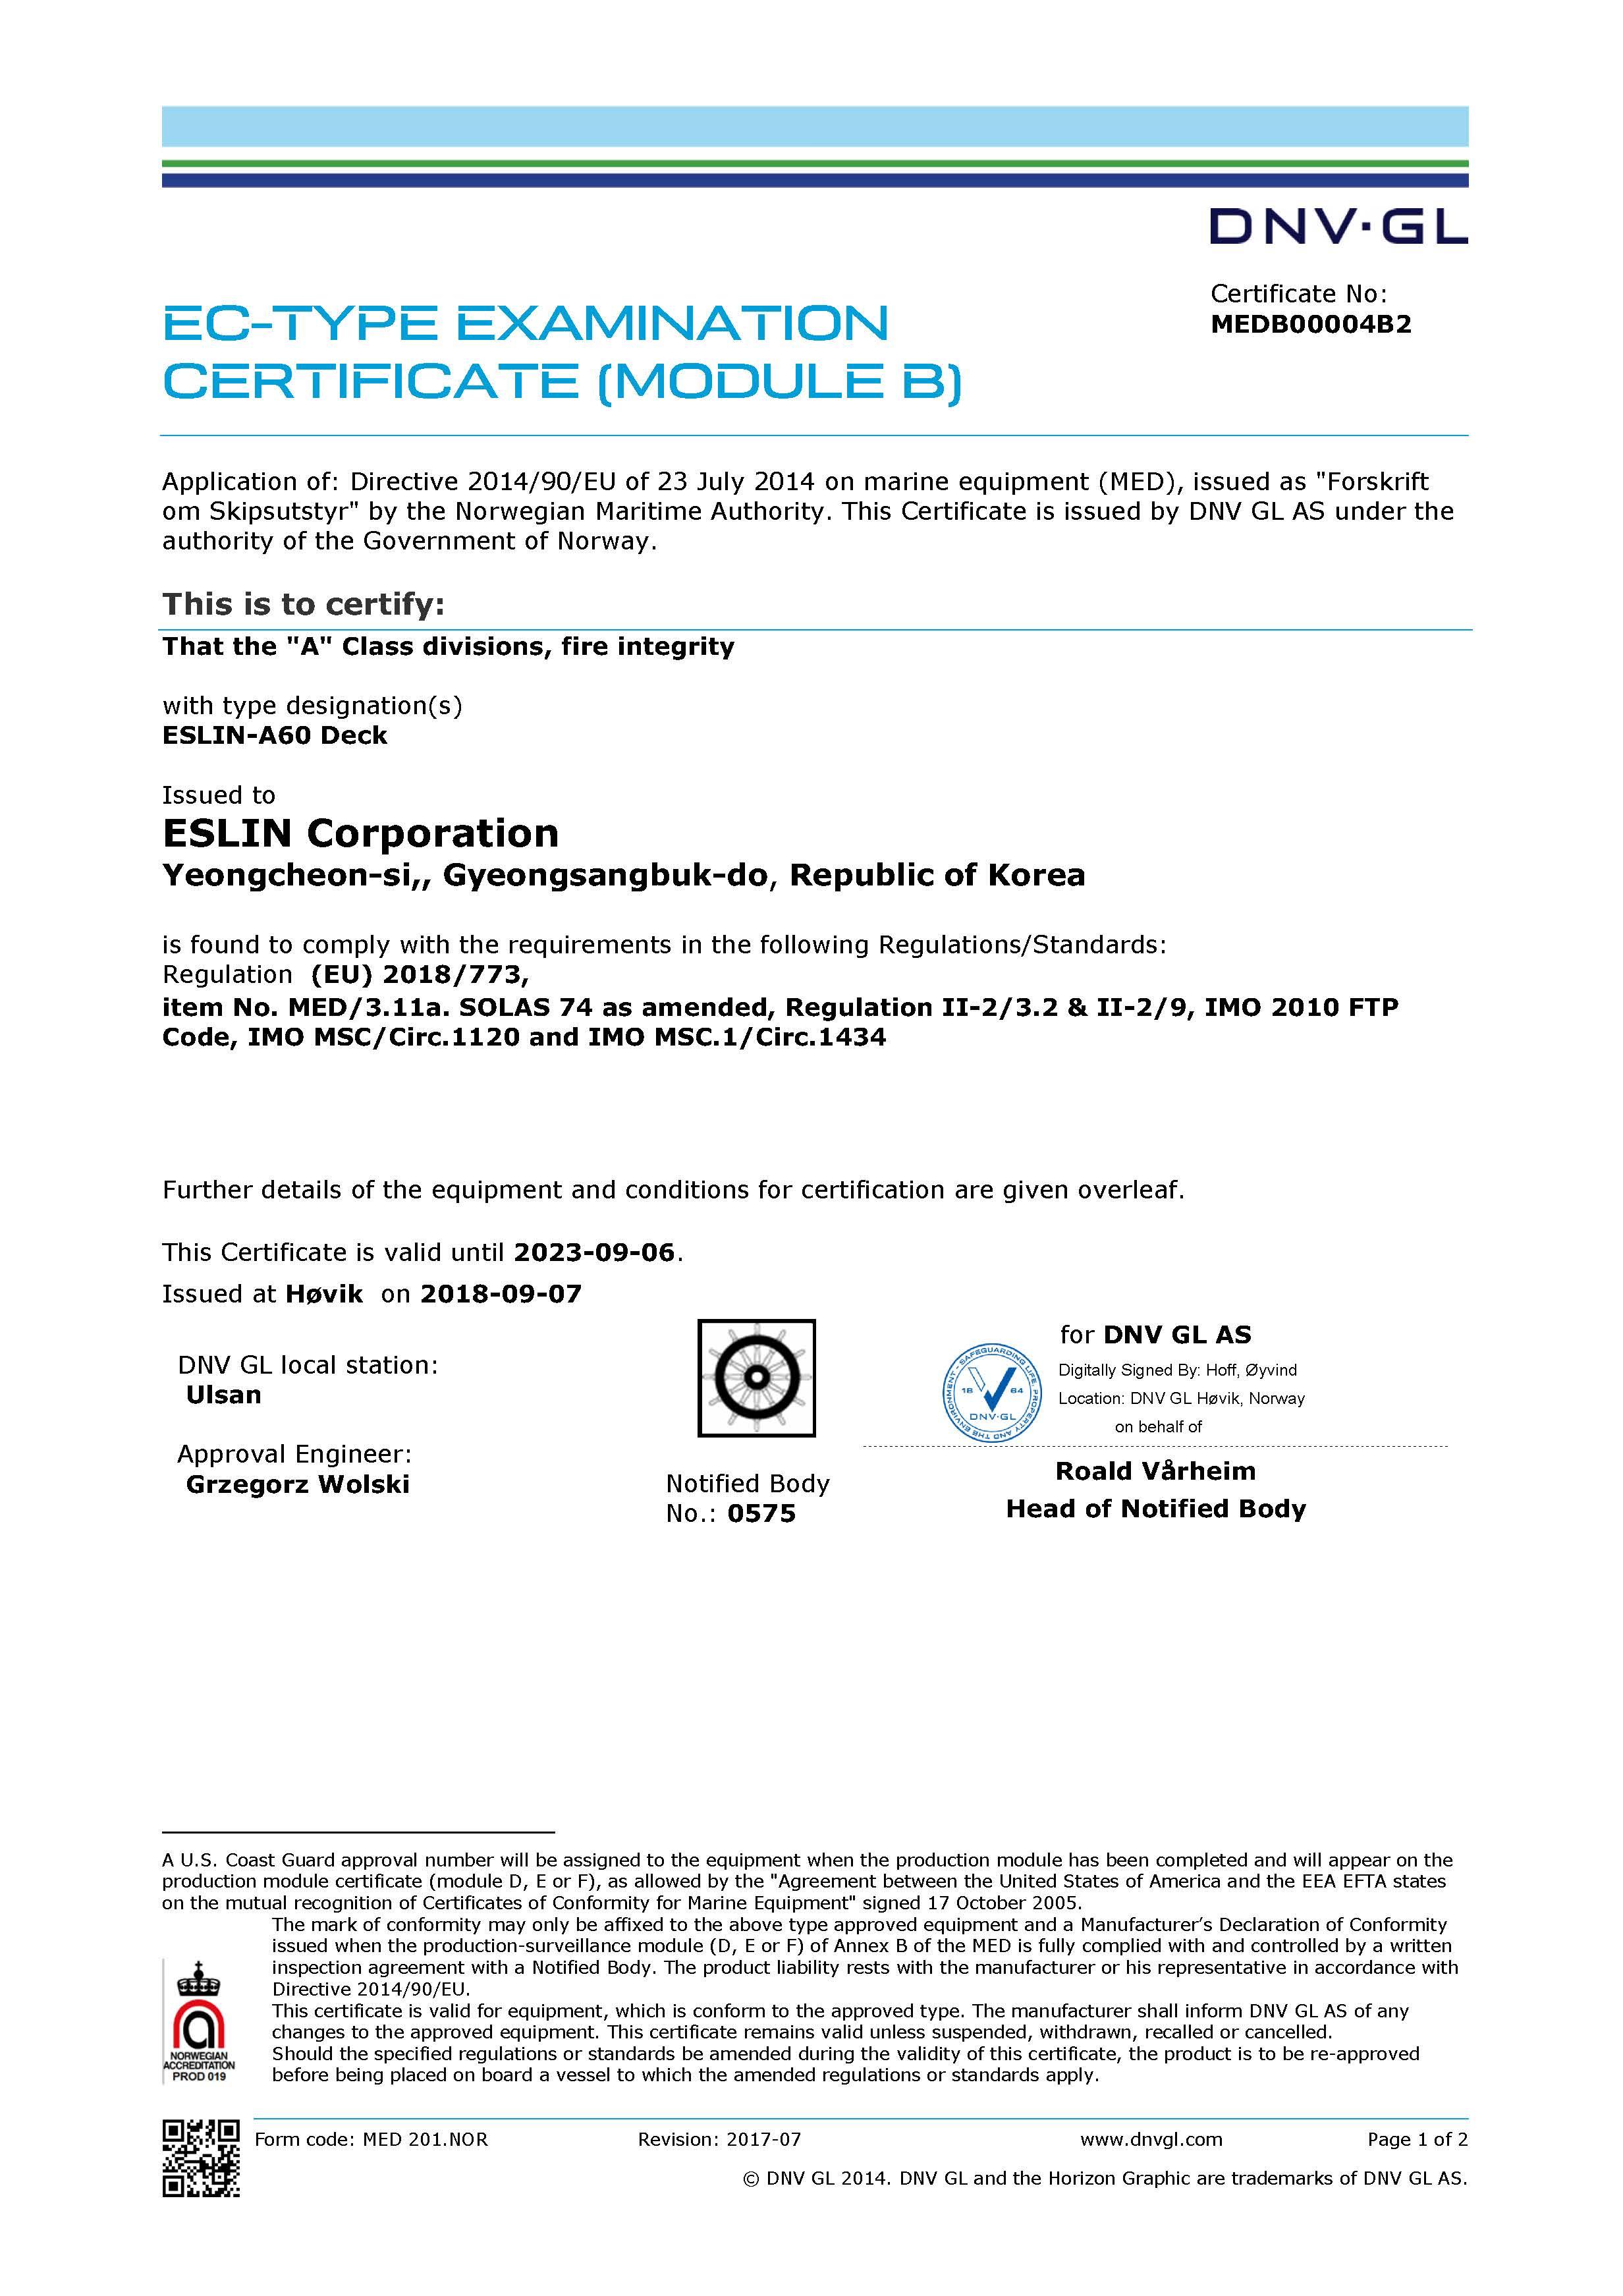 15_ESLIN A60-Deck_DNV_MEDB00004B2_Page_1.jpg